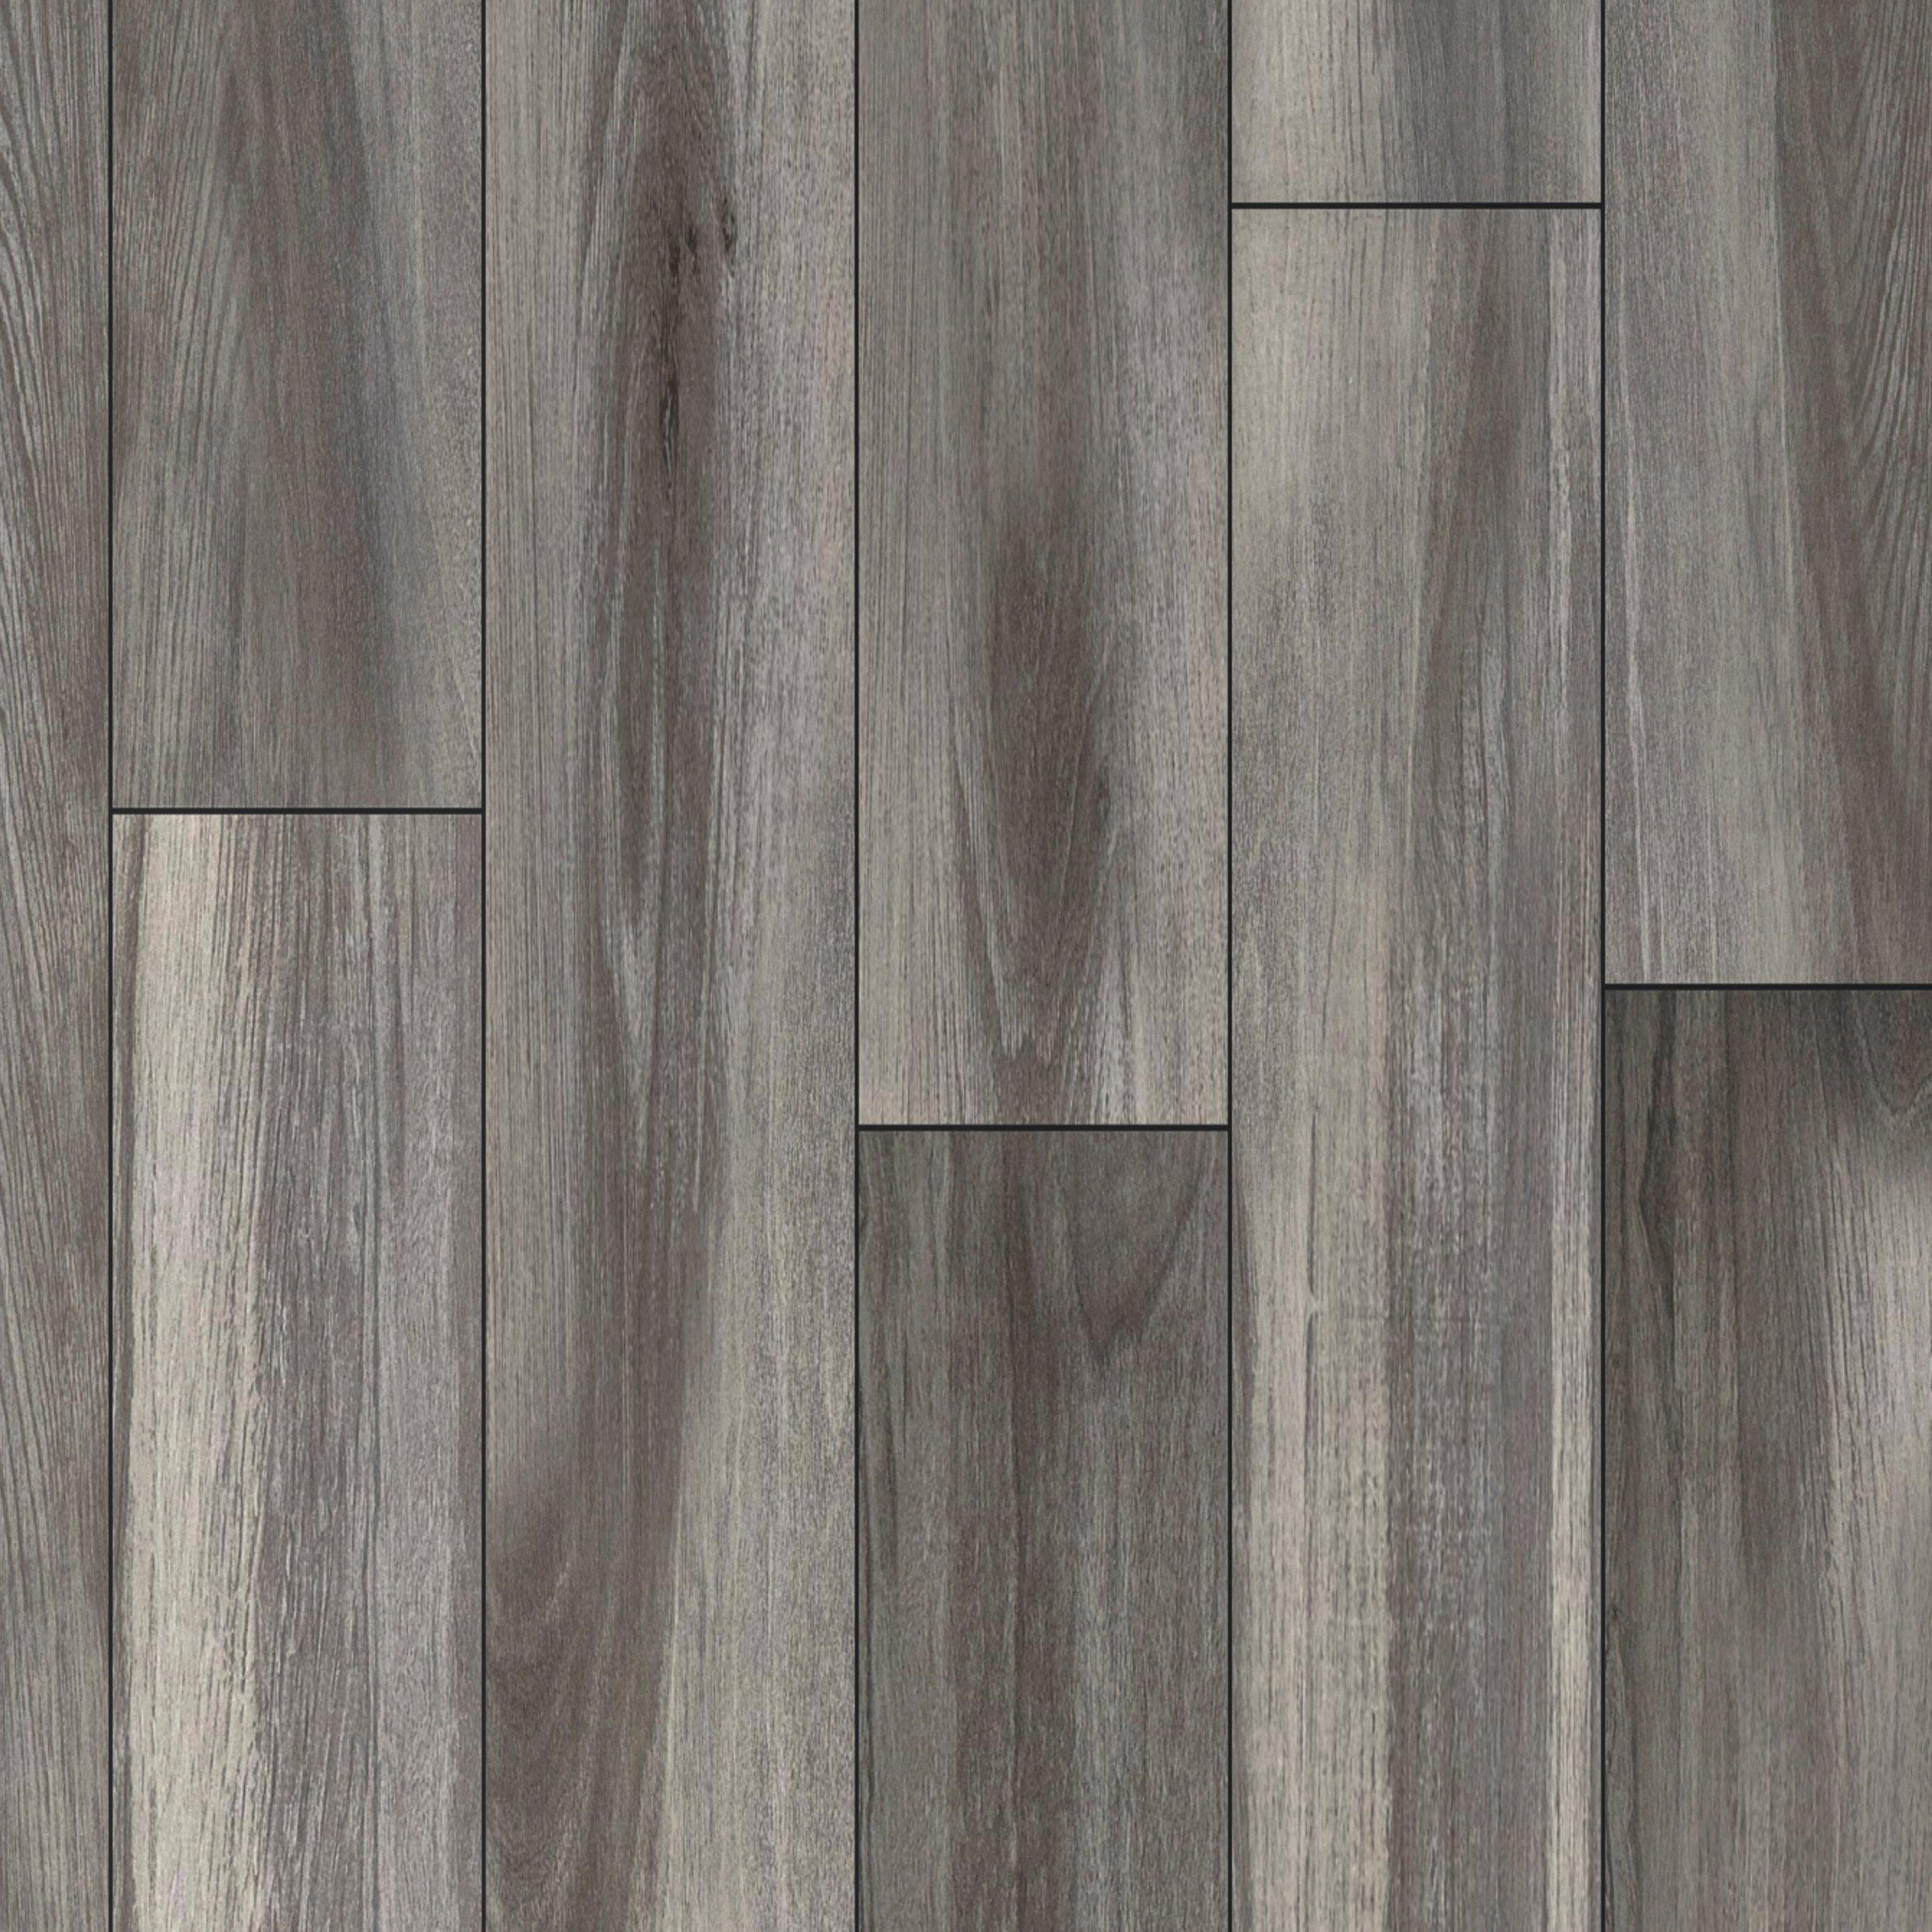 woodhaven grey wood plank porcelain